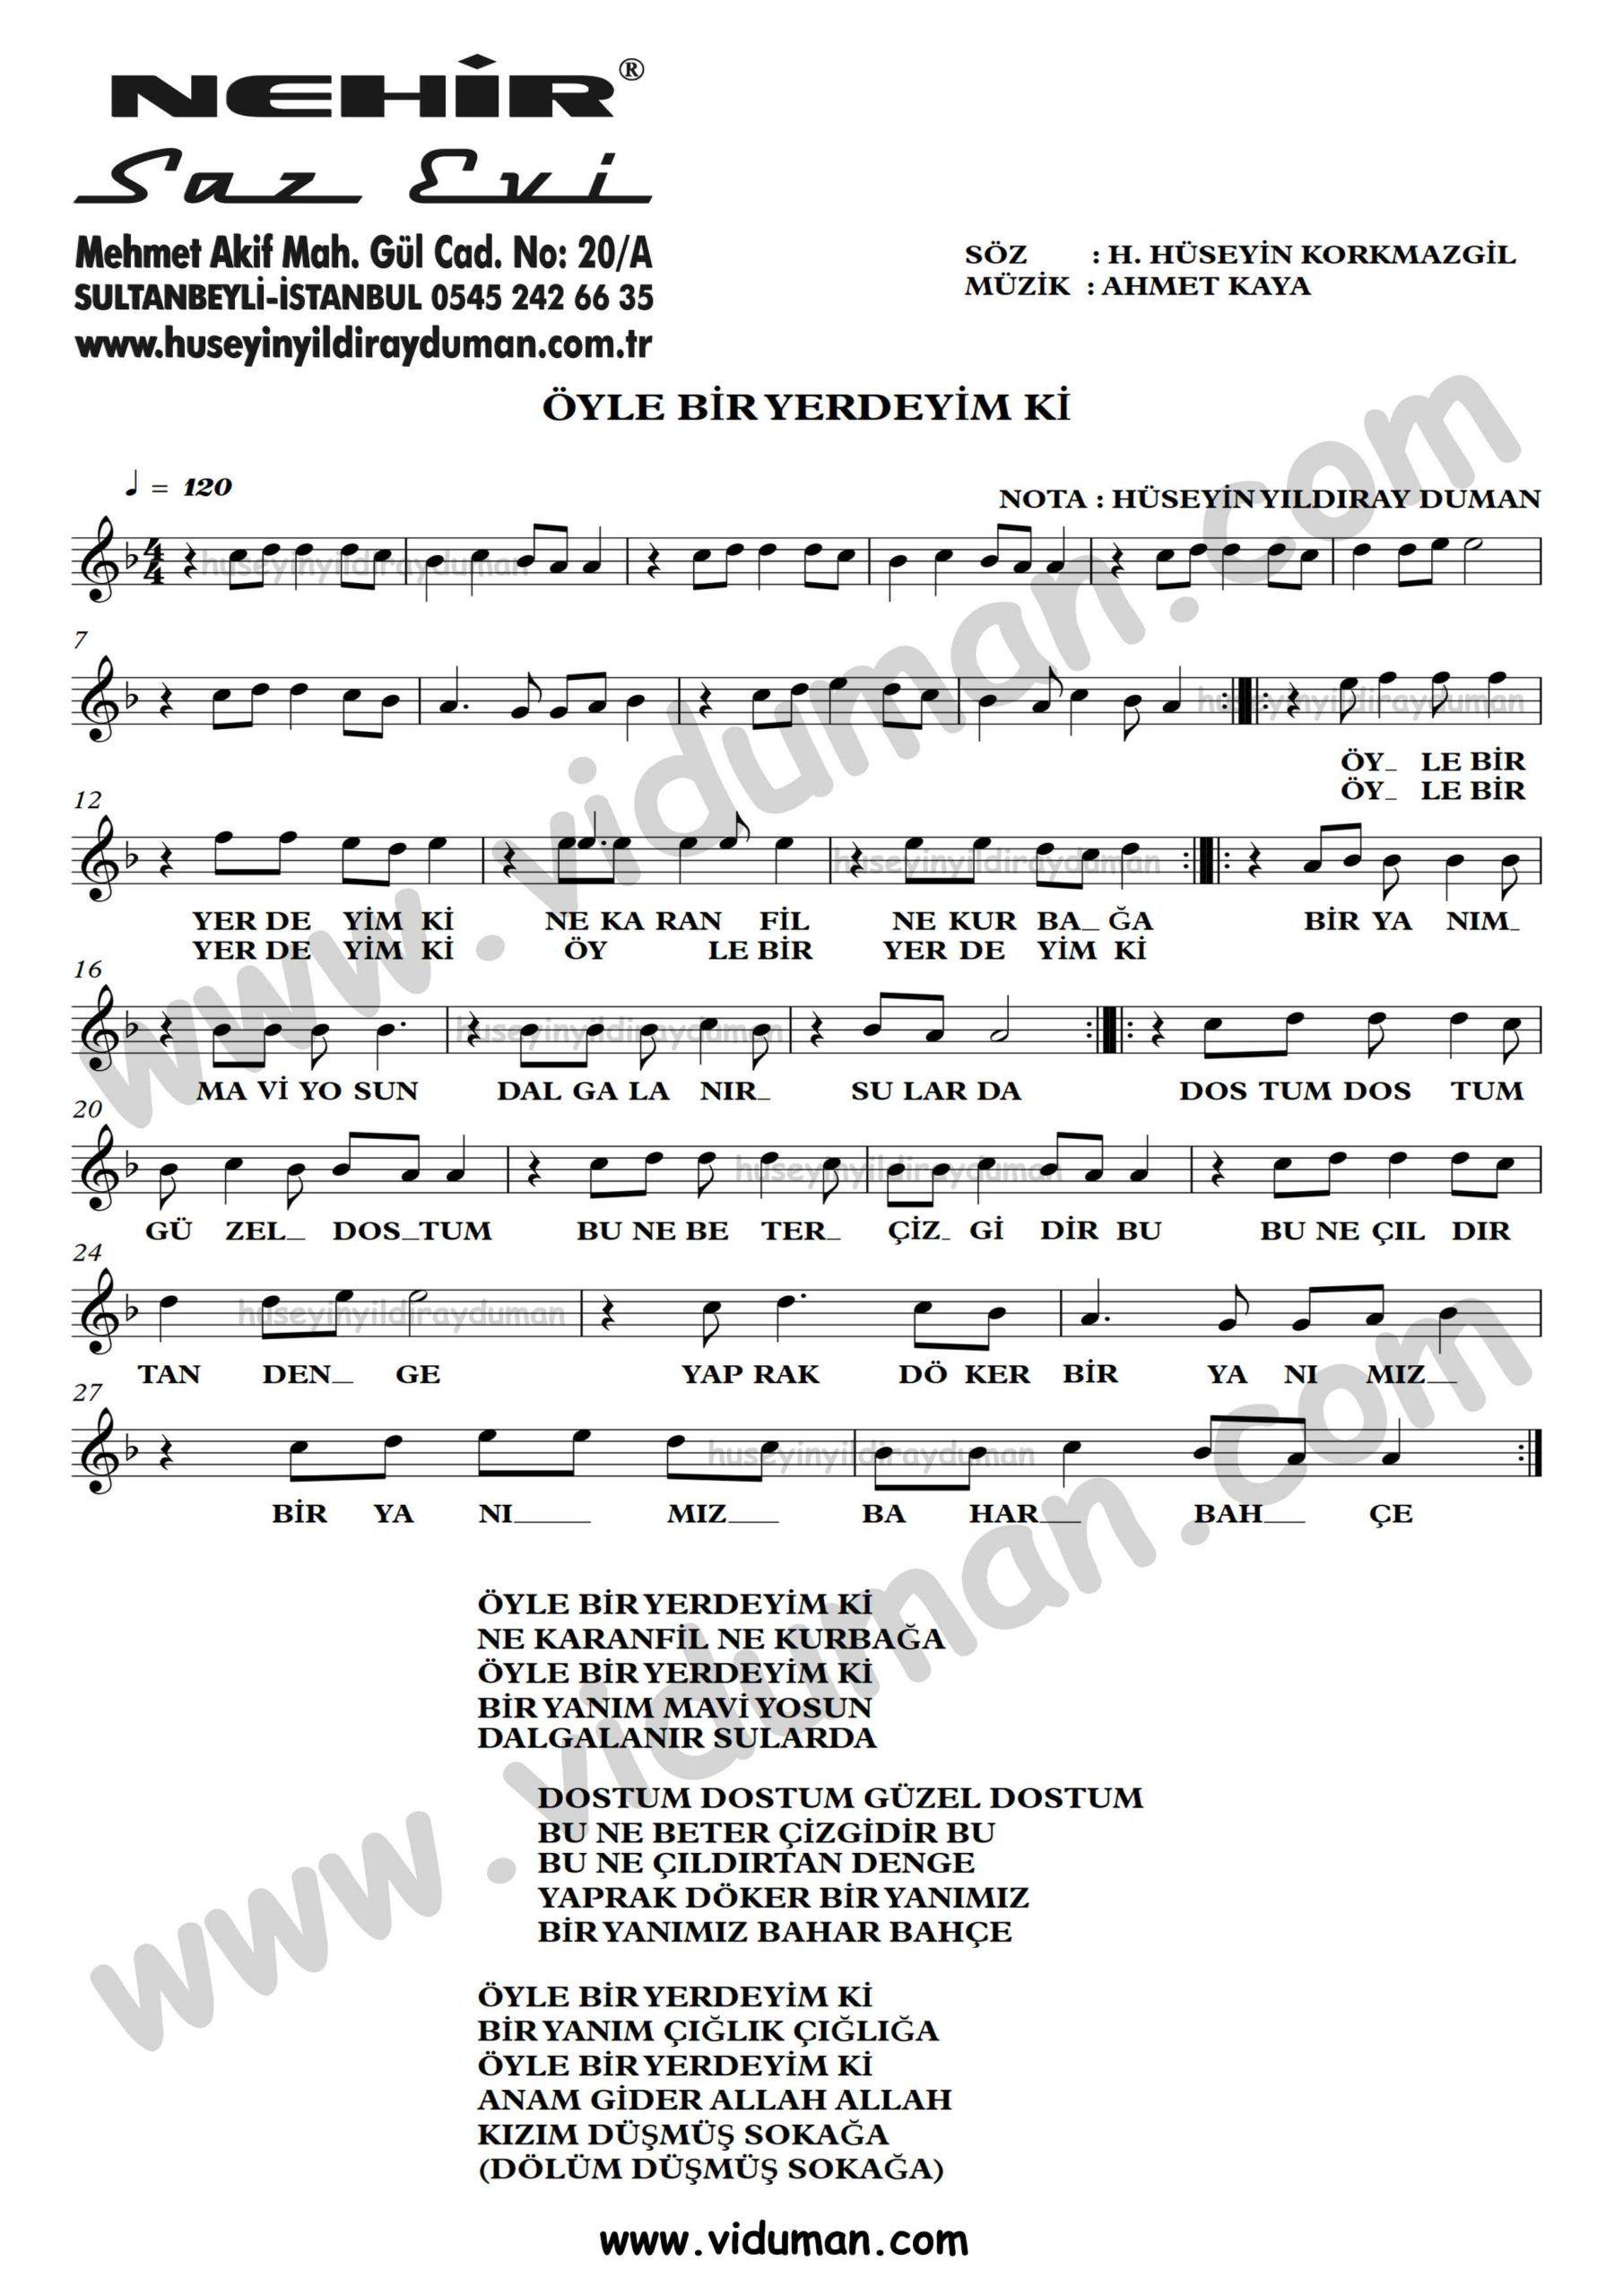 Oyle Bir Yerdeyim Ki Ahmet Kaya Nota Baglama Saz Turku Notalari Muzik Notalari Muzik Yerler